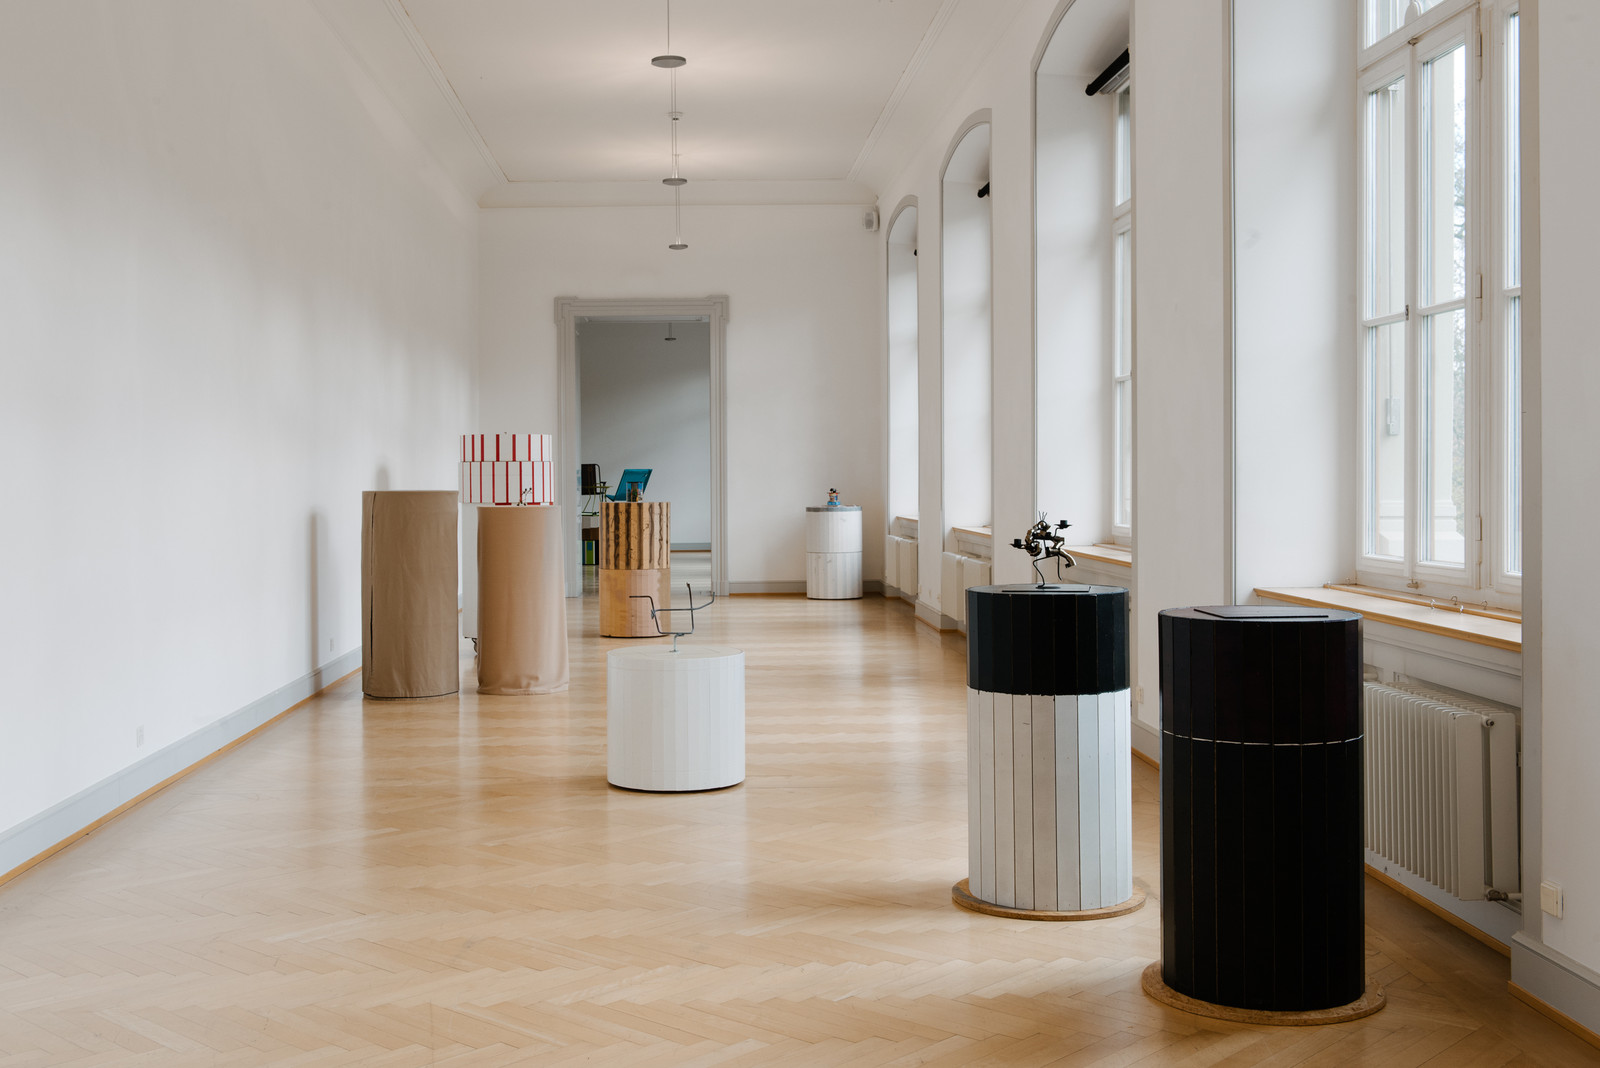 15_Installationsansicht_St.Gallen__Foto_Sebastian_Stadler